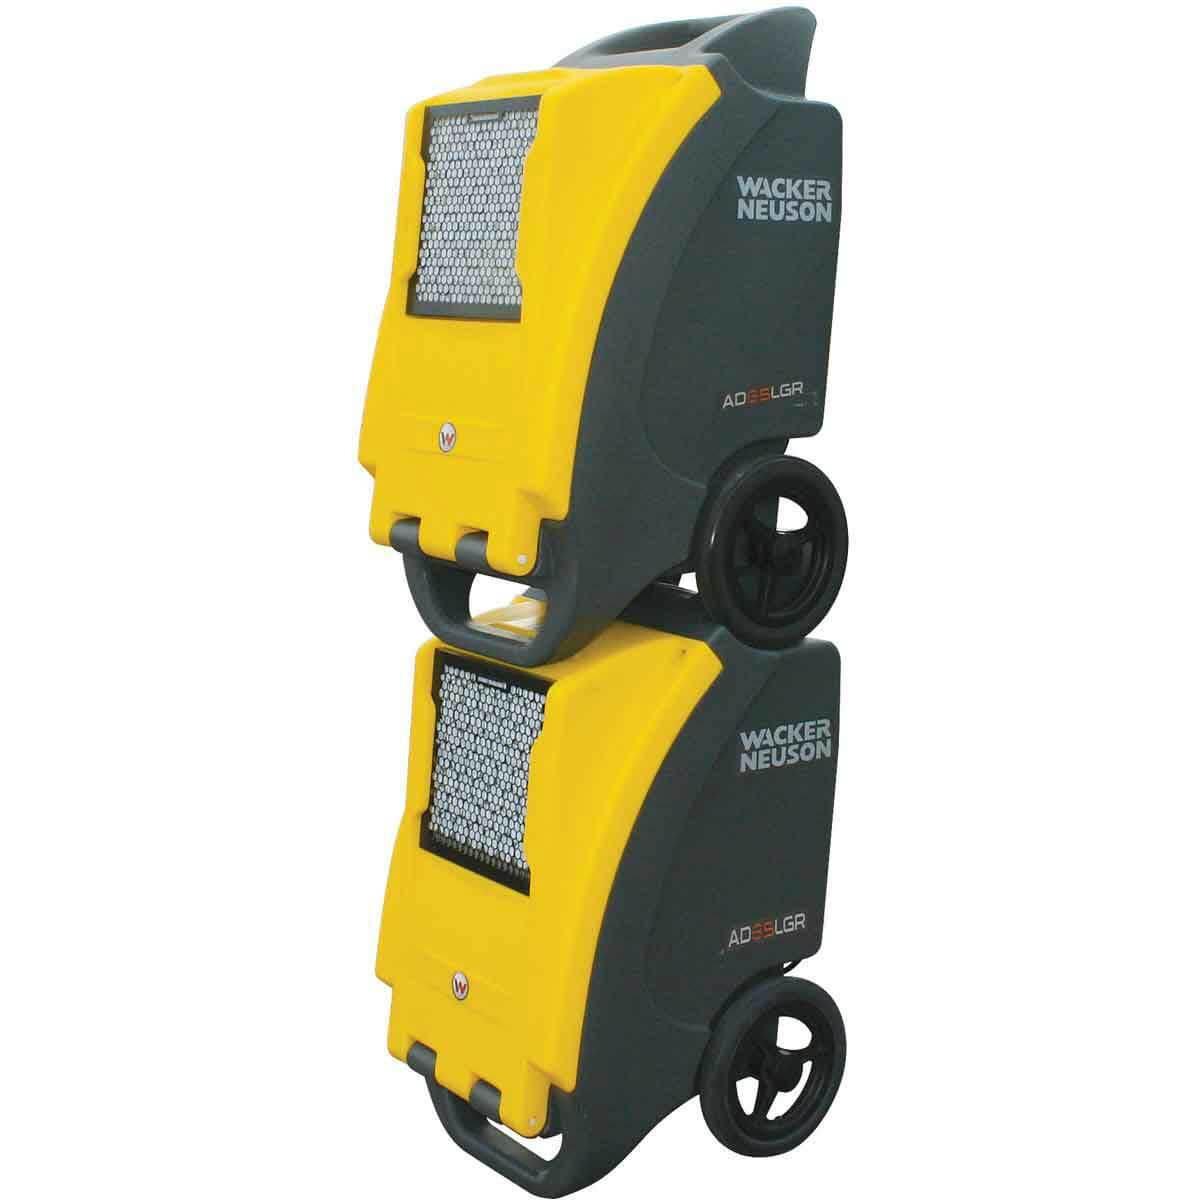 5000620695 Portable Dehumidifiers Wacker Neuson